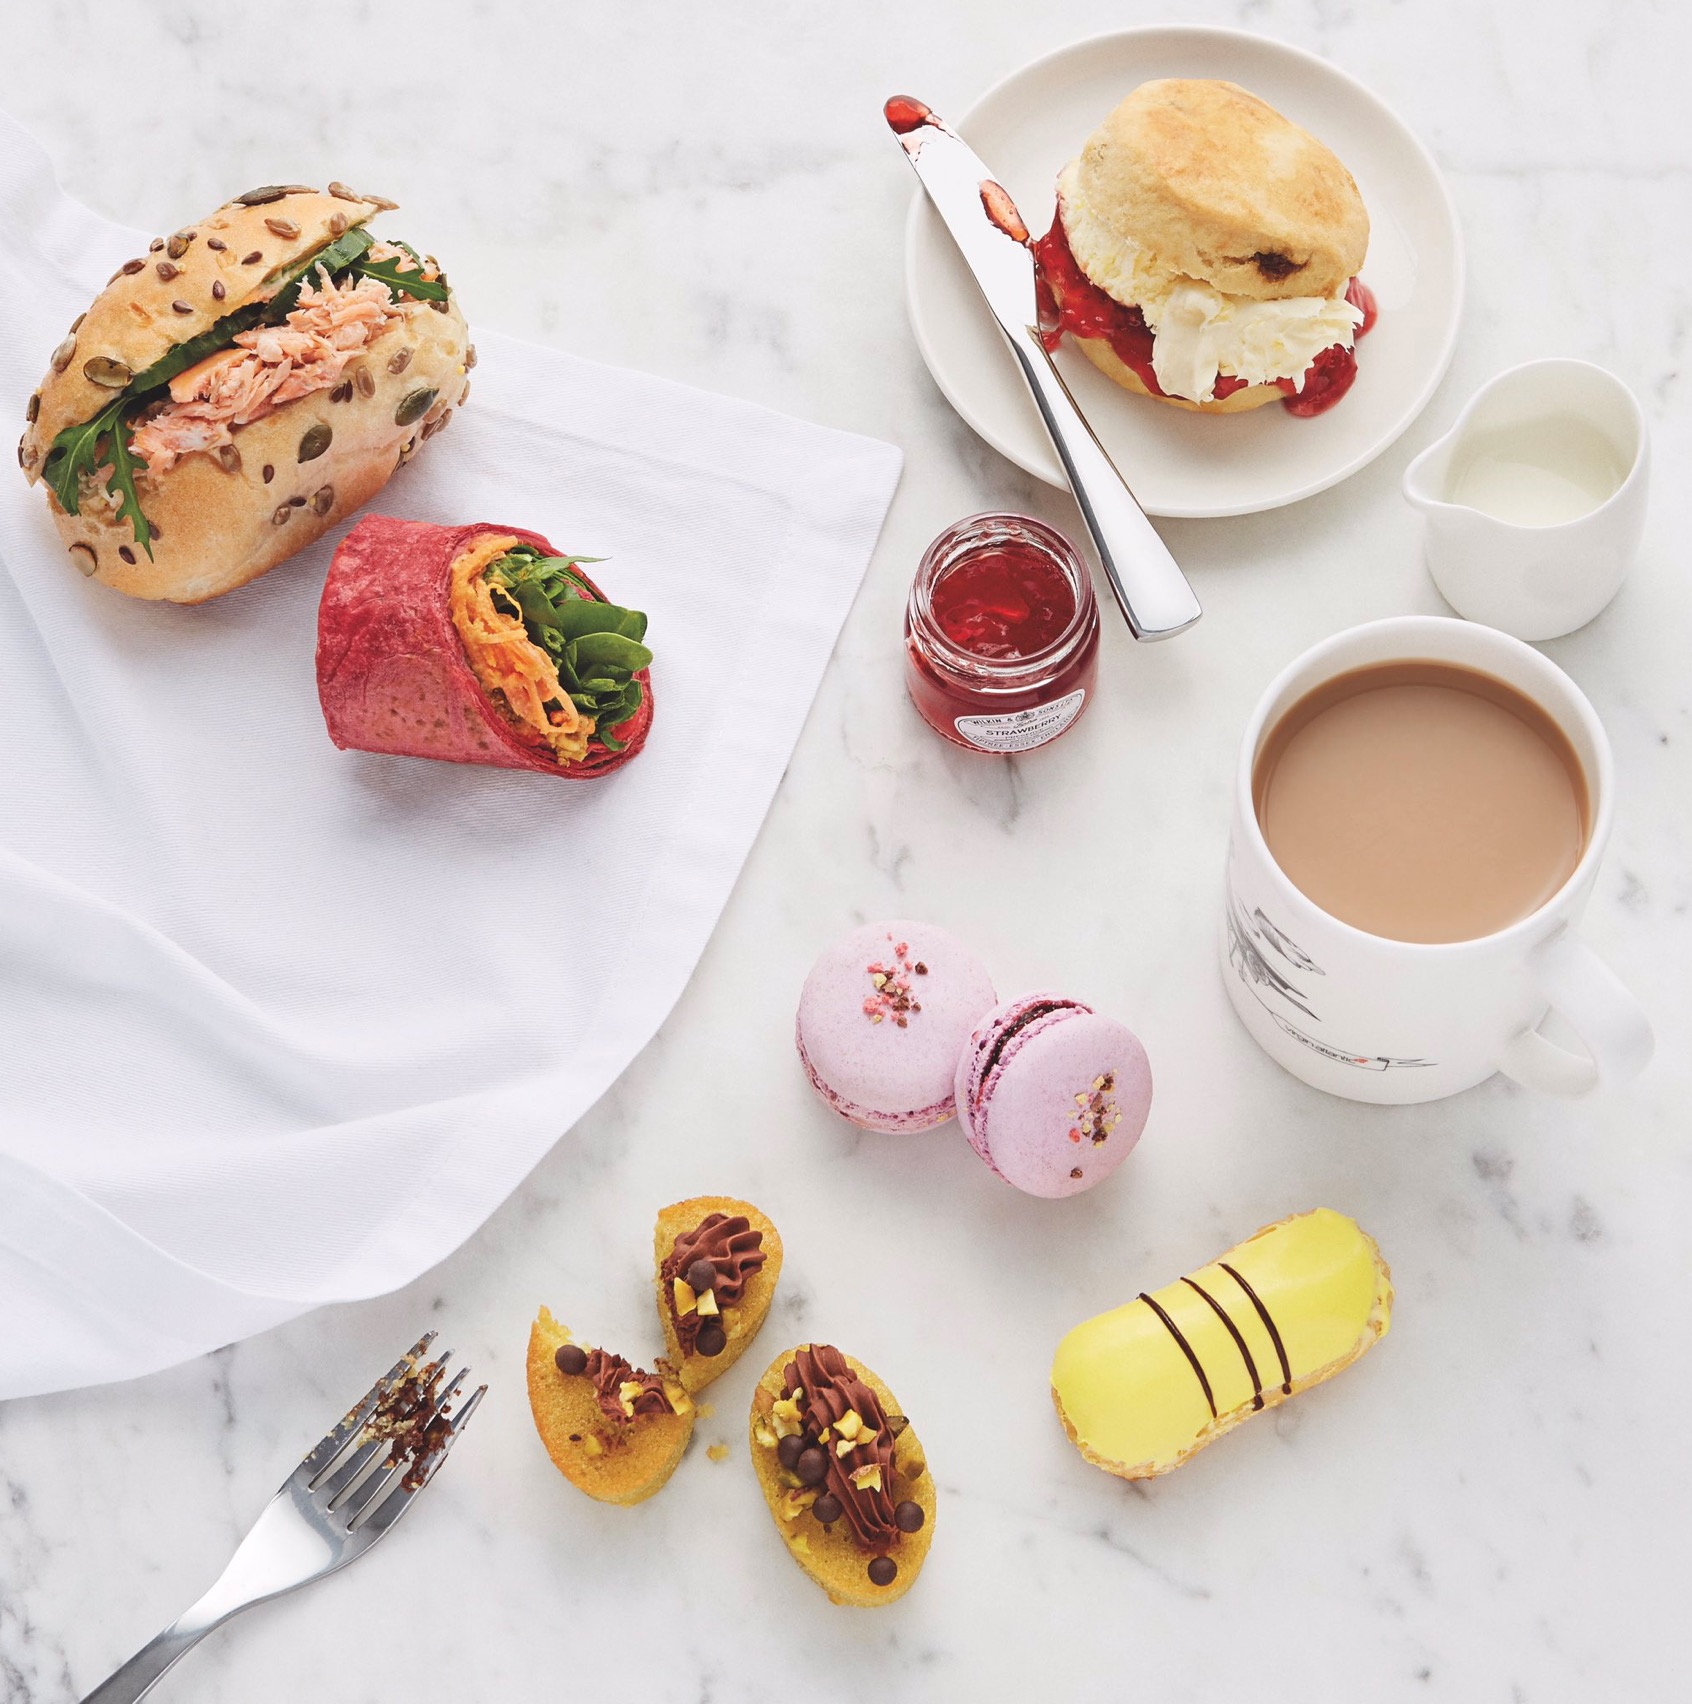 Virgin Atlantic's photo-friendly afternoon tea is bang on